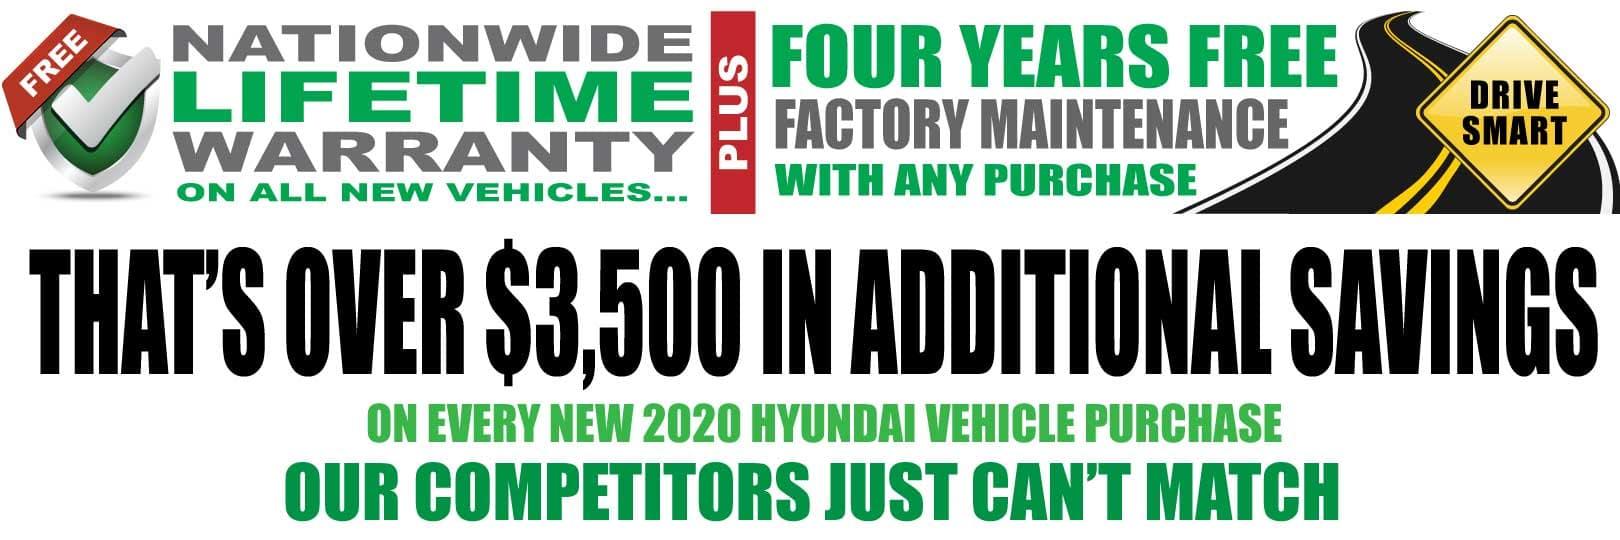 Lakeland Hyundai Lifetime Warranty